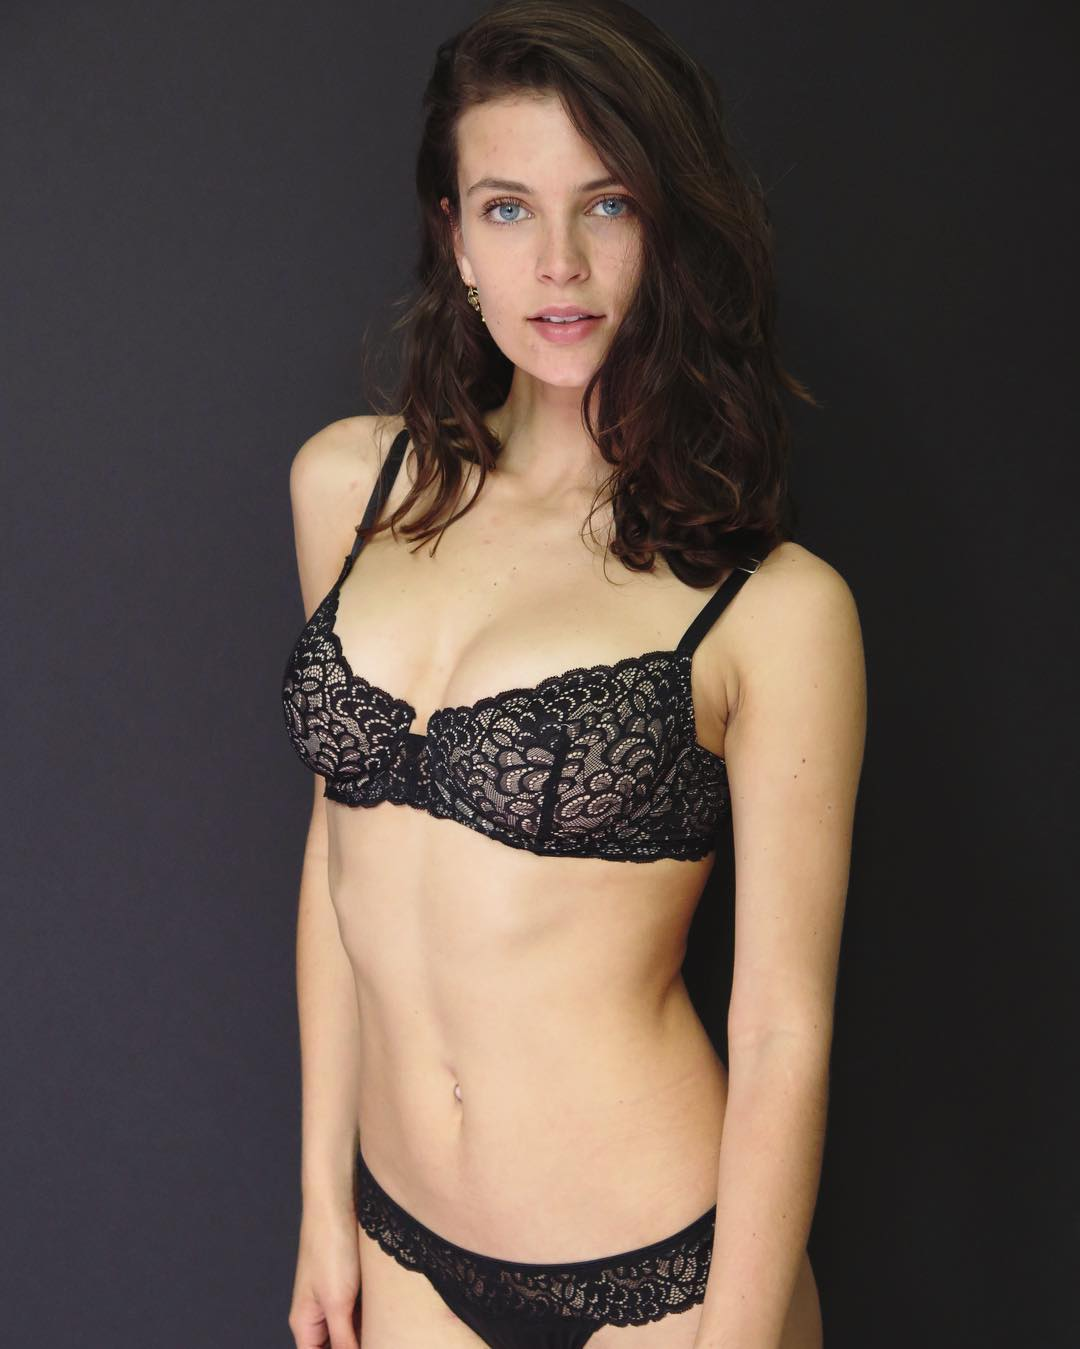 Kathleen Sorbara nudes (84 foto and video), Tits, Bikini, Instagram, lingerie 2019